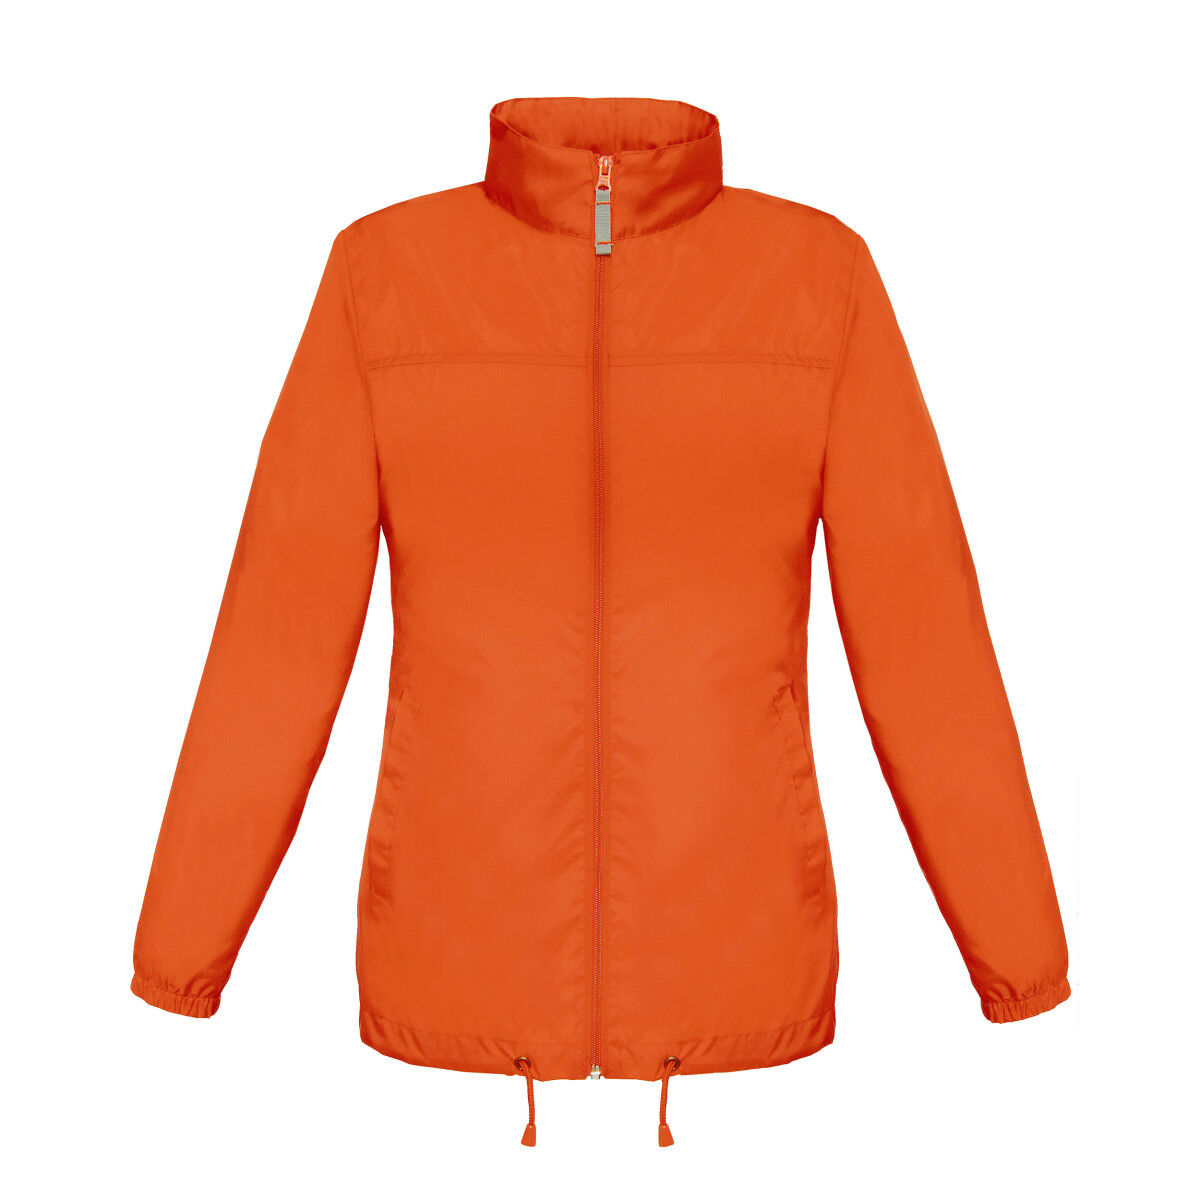 B&C Sirocco Lightweight Jacket (Orange)